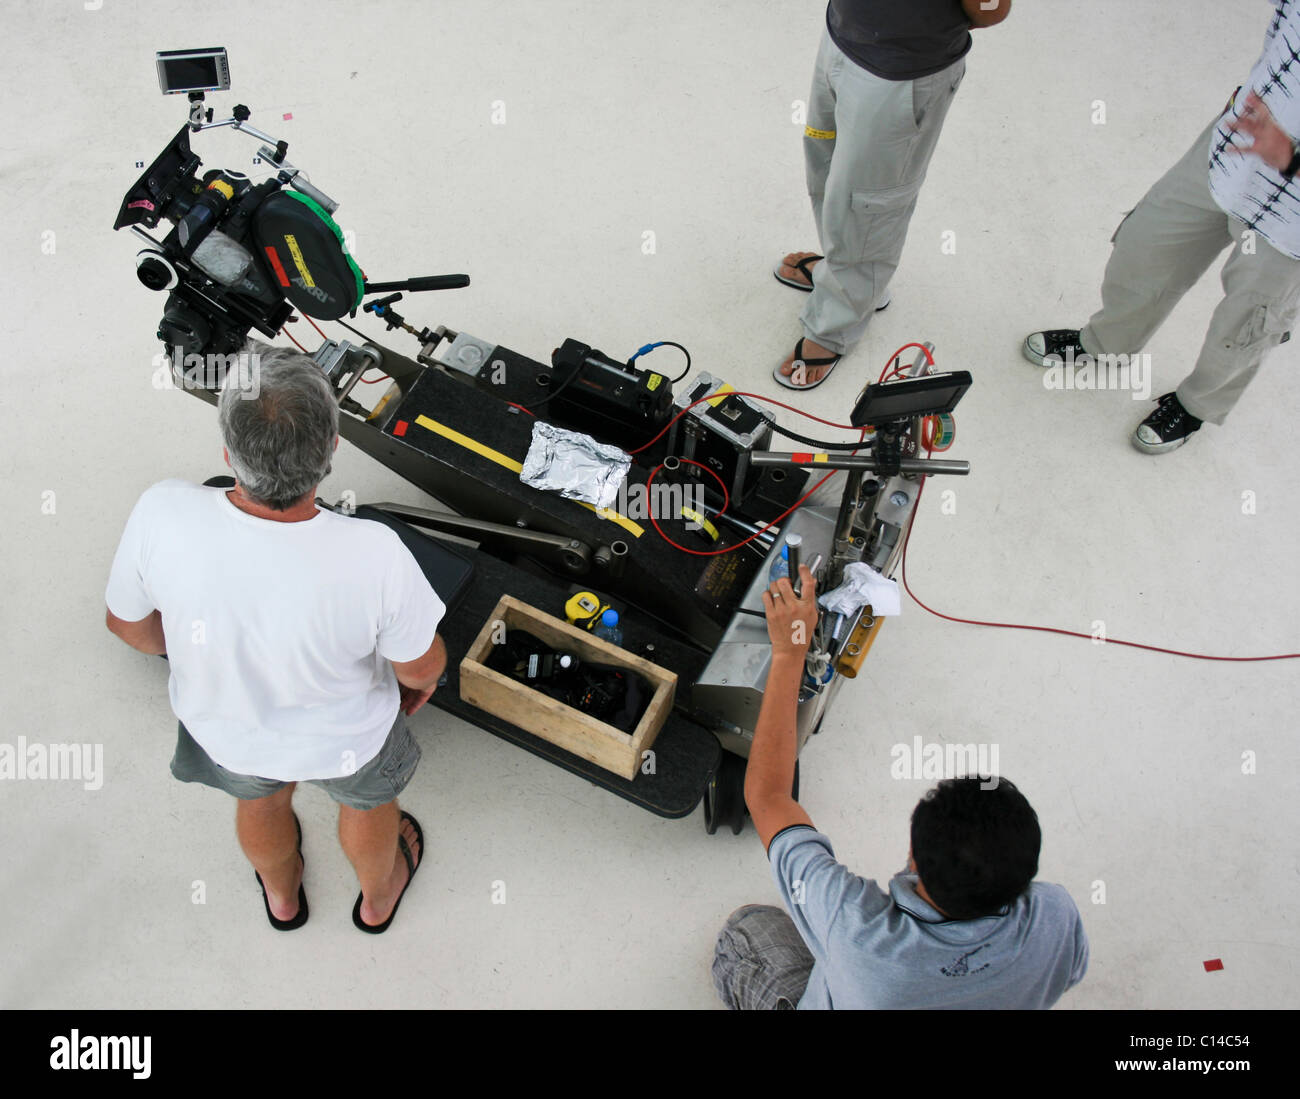 film crew on a shoot - Stock Image